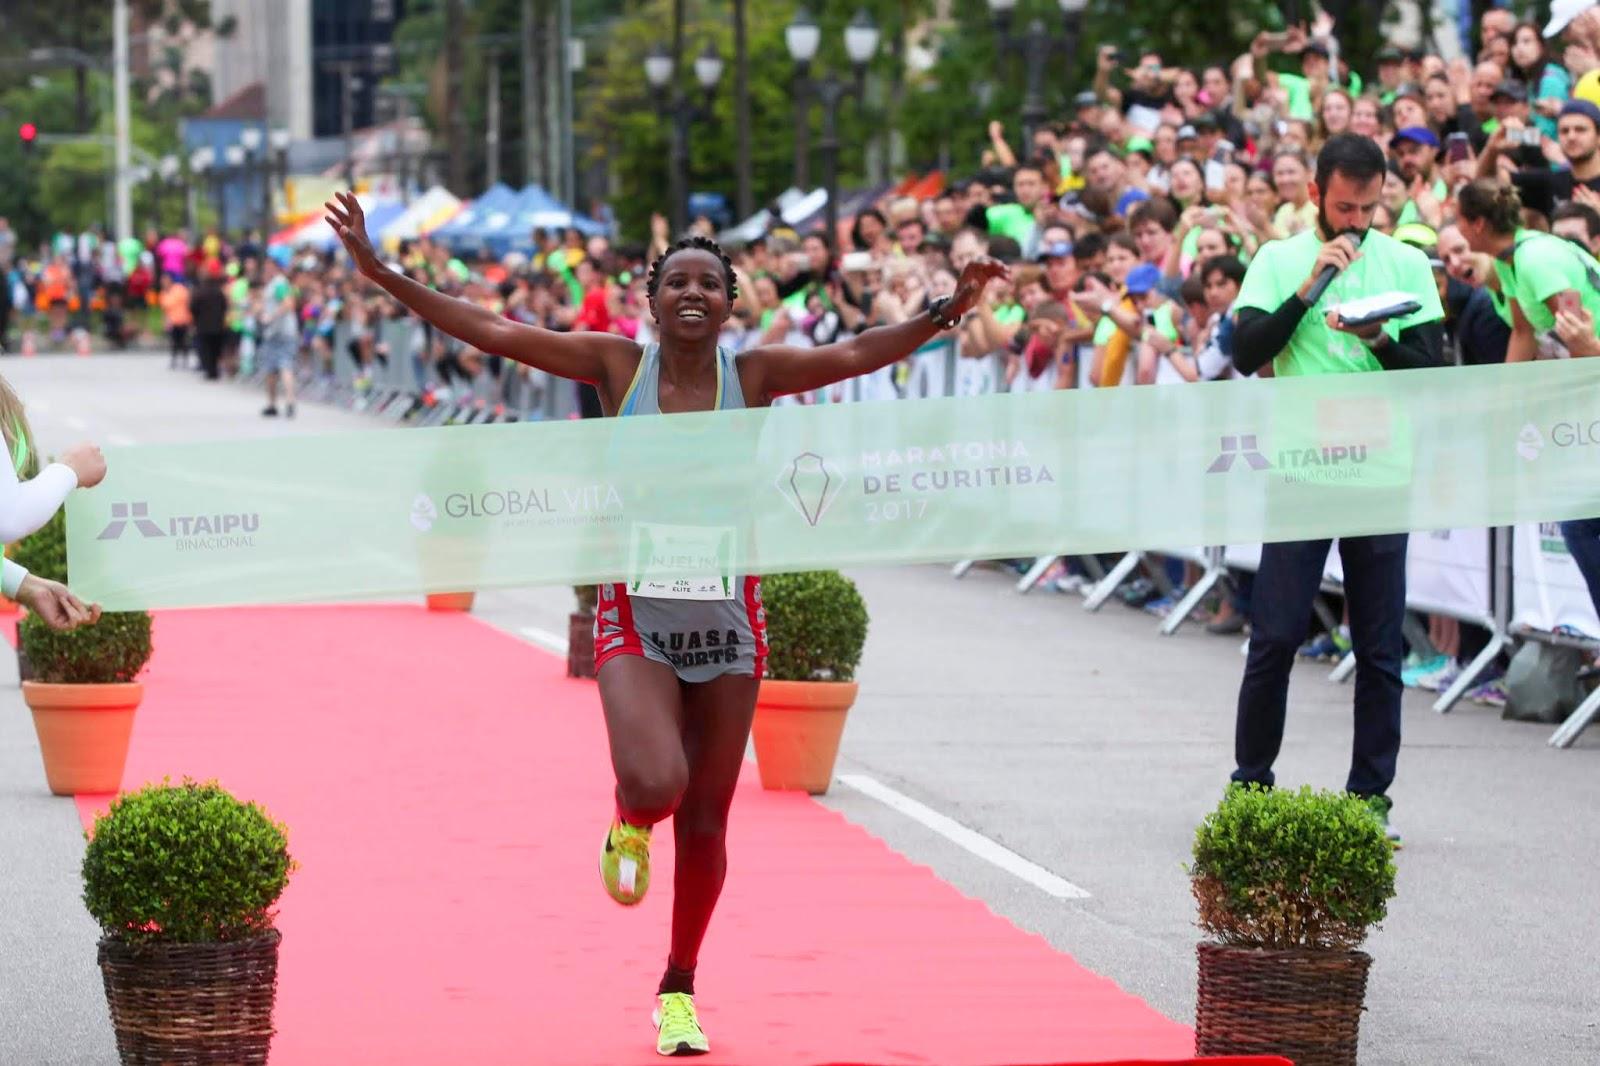 Maratona de Curitiba